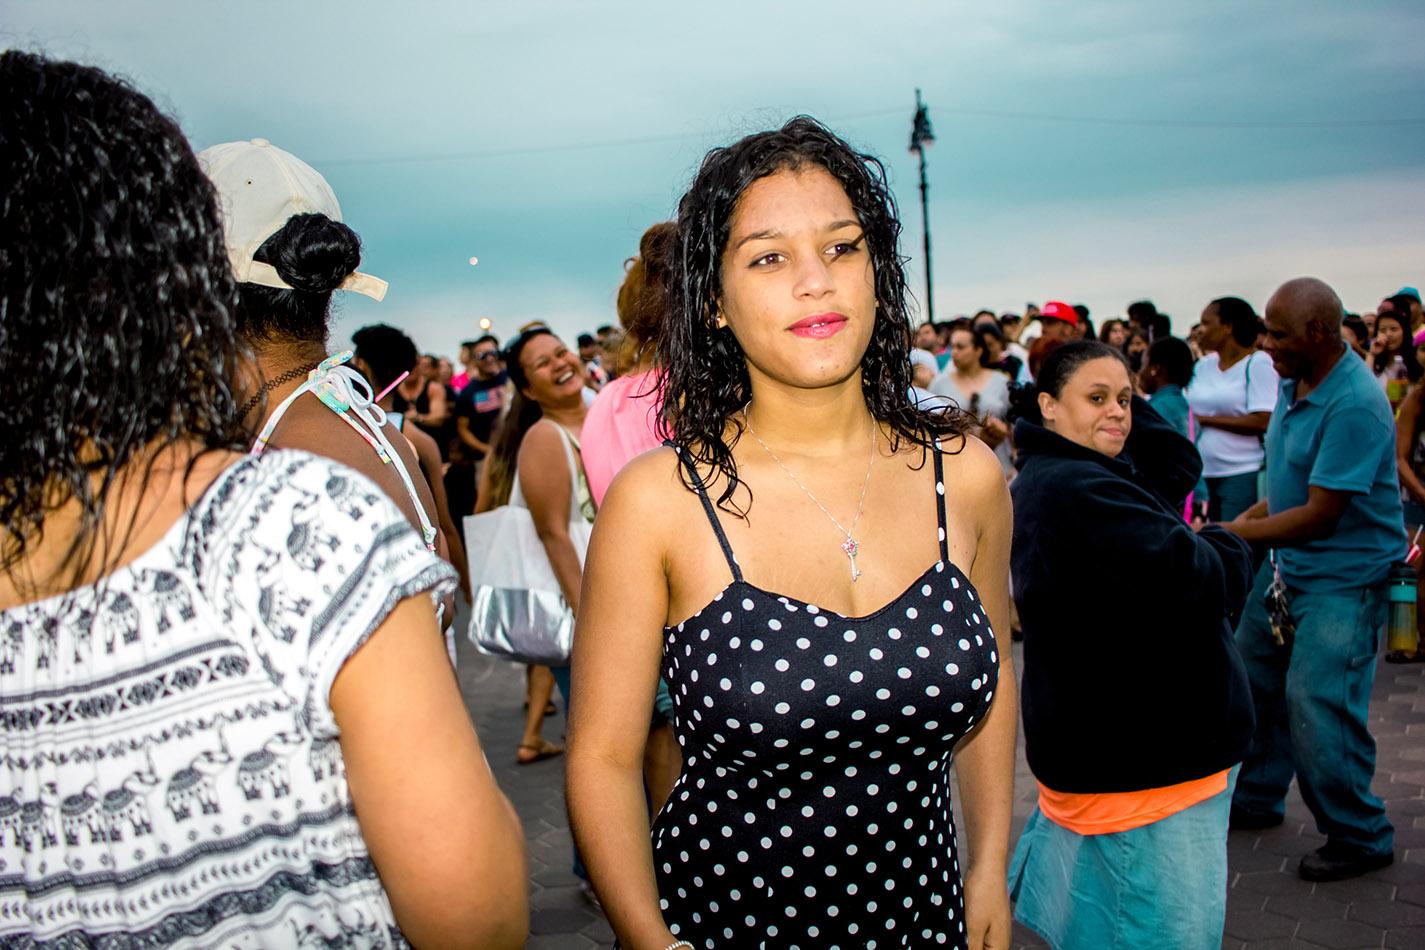 4th of July - Coney Island, 2016